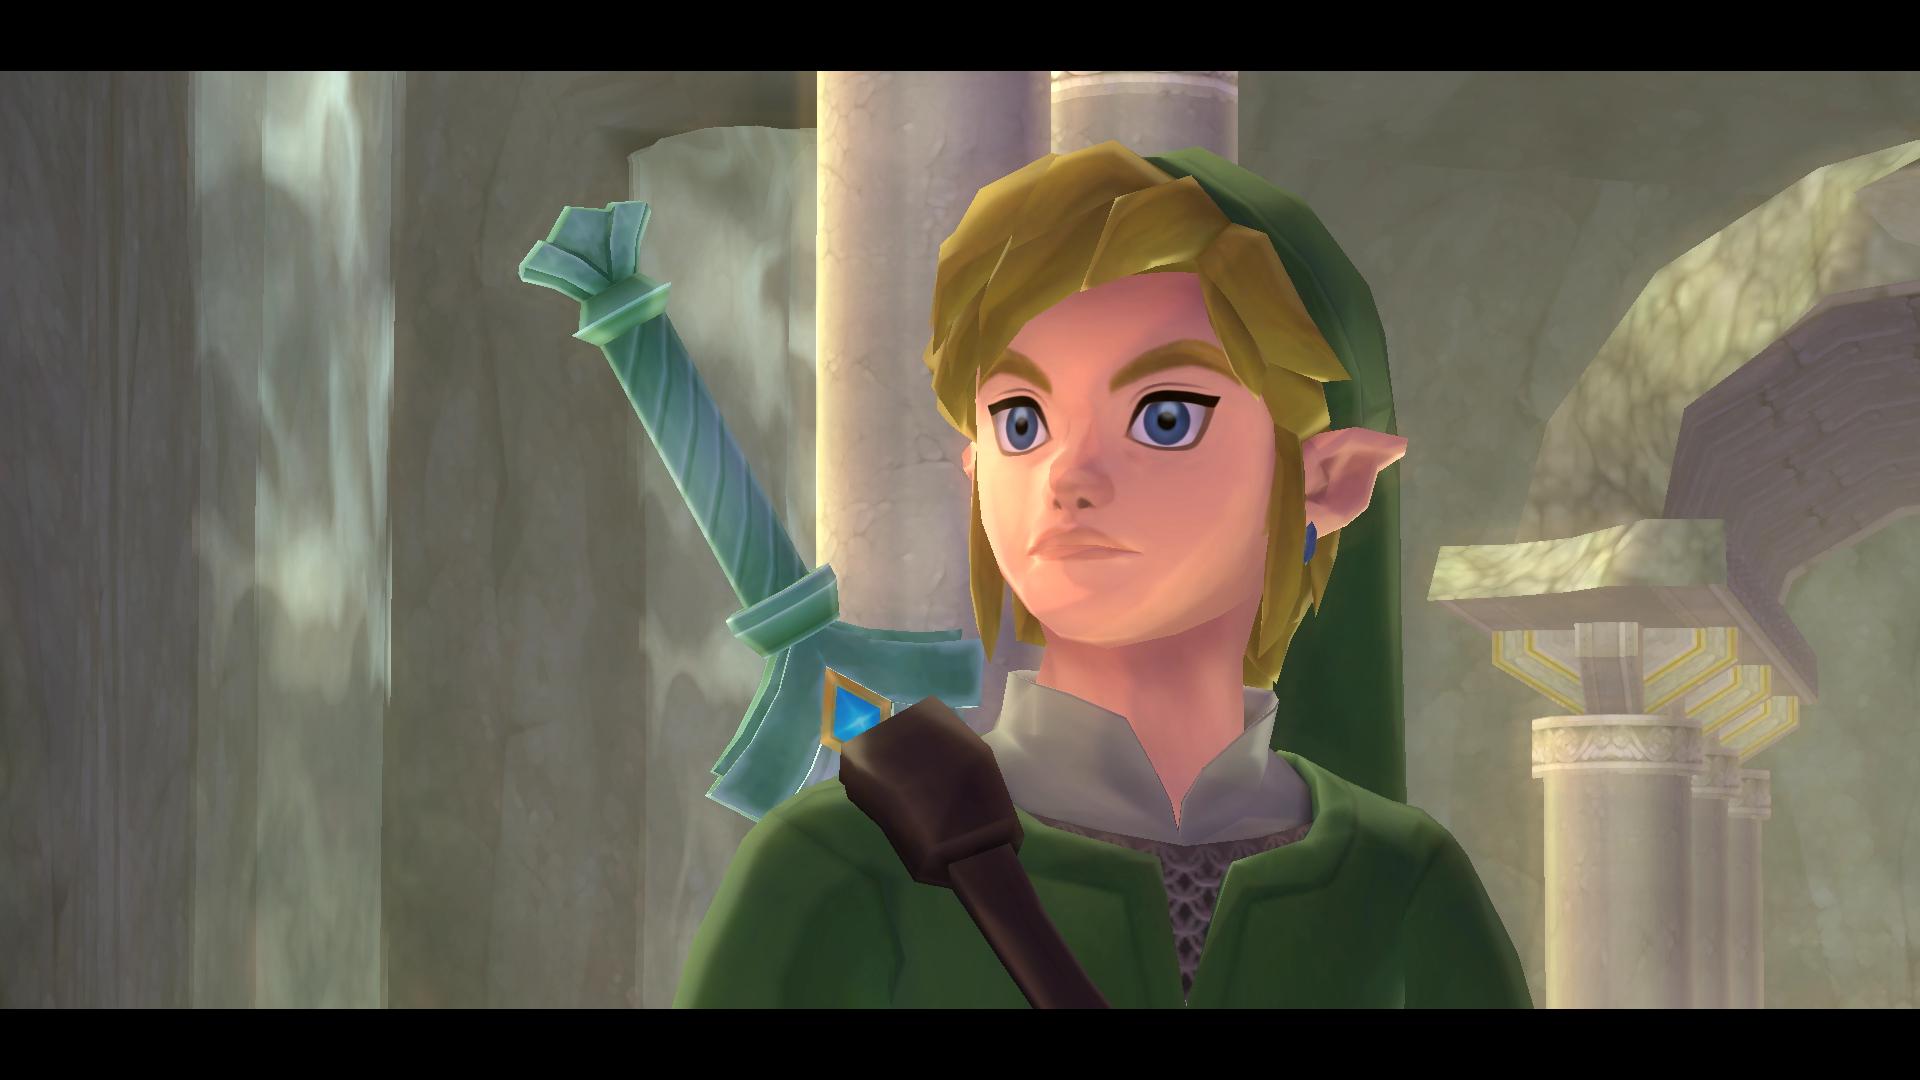 Link from The Legend of Zelda: Skyward Sword HD